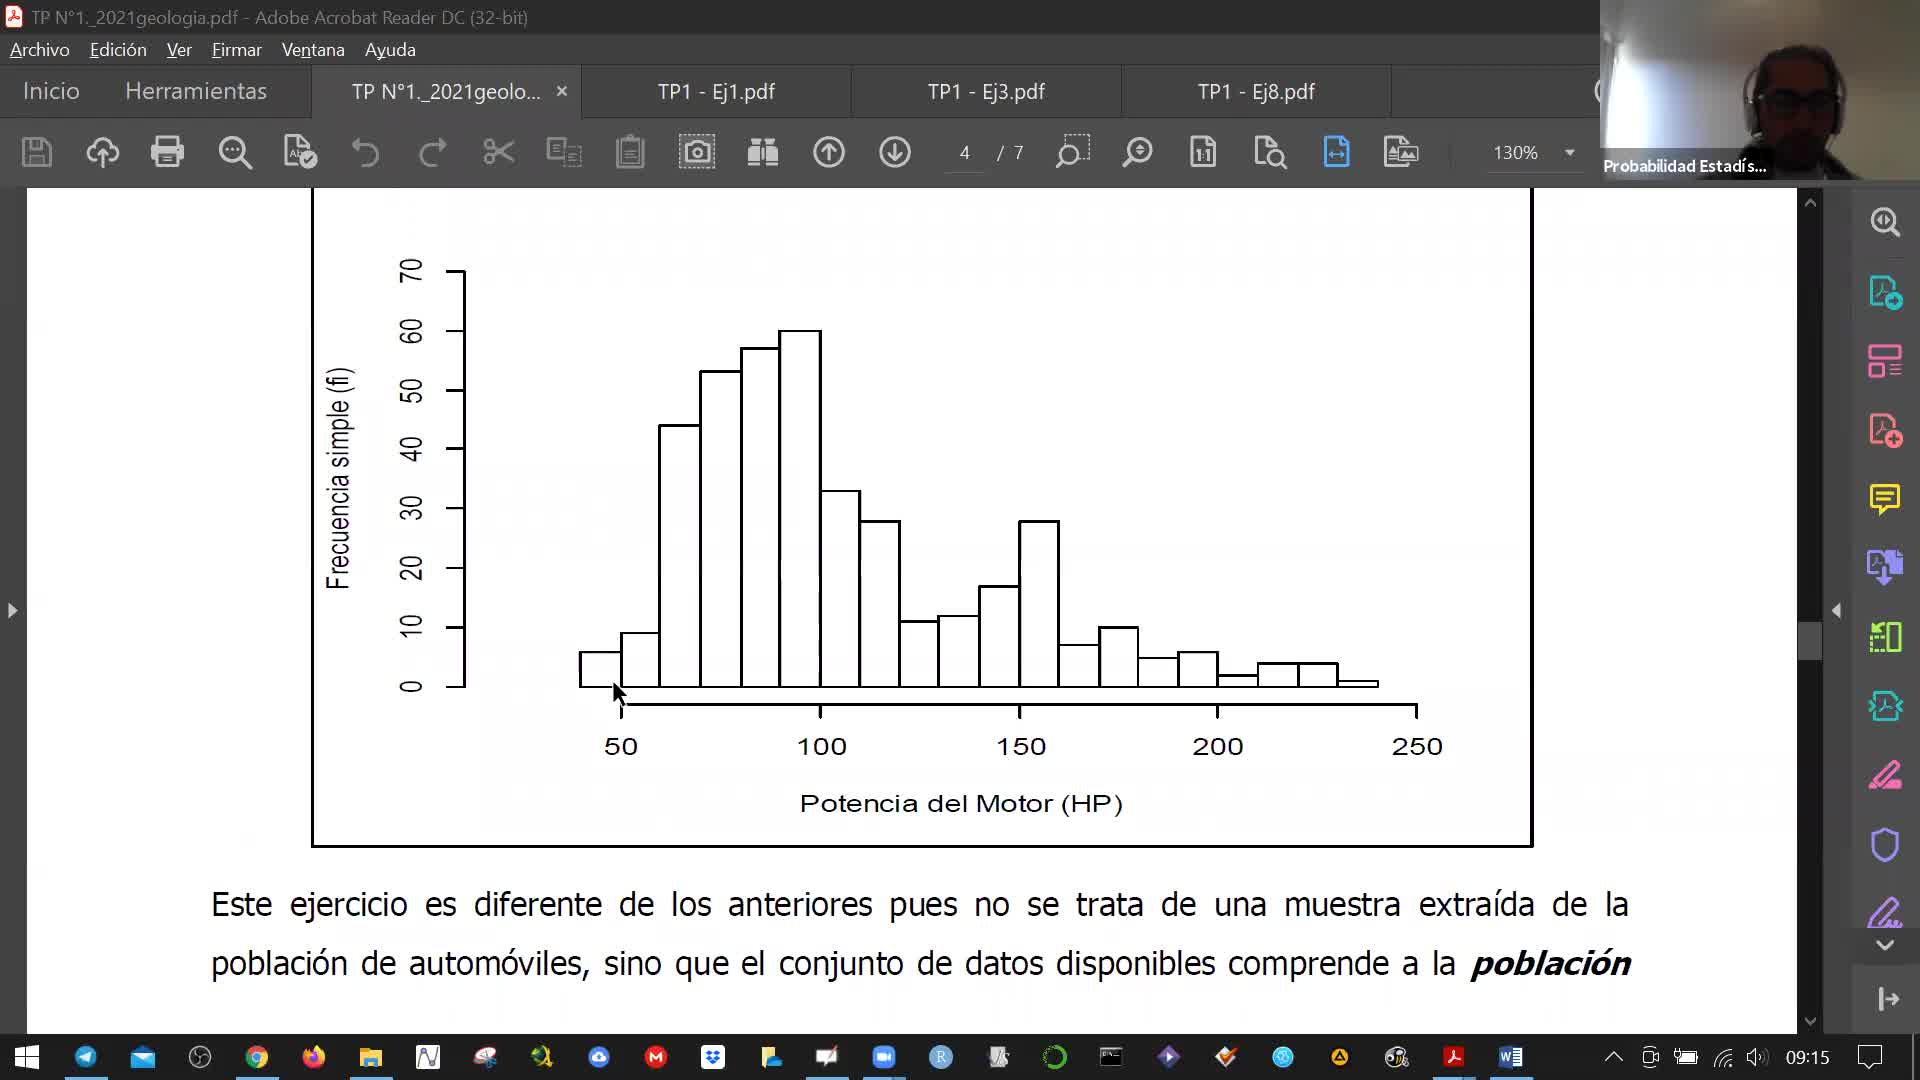 2021-04-09 Pt.1 - Práctica Estadística Descriptiva (Consultas TP1)